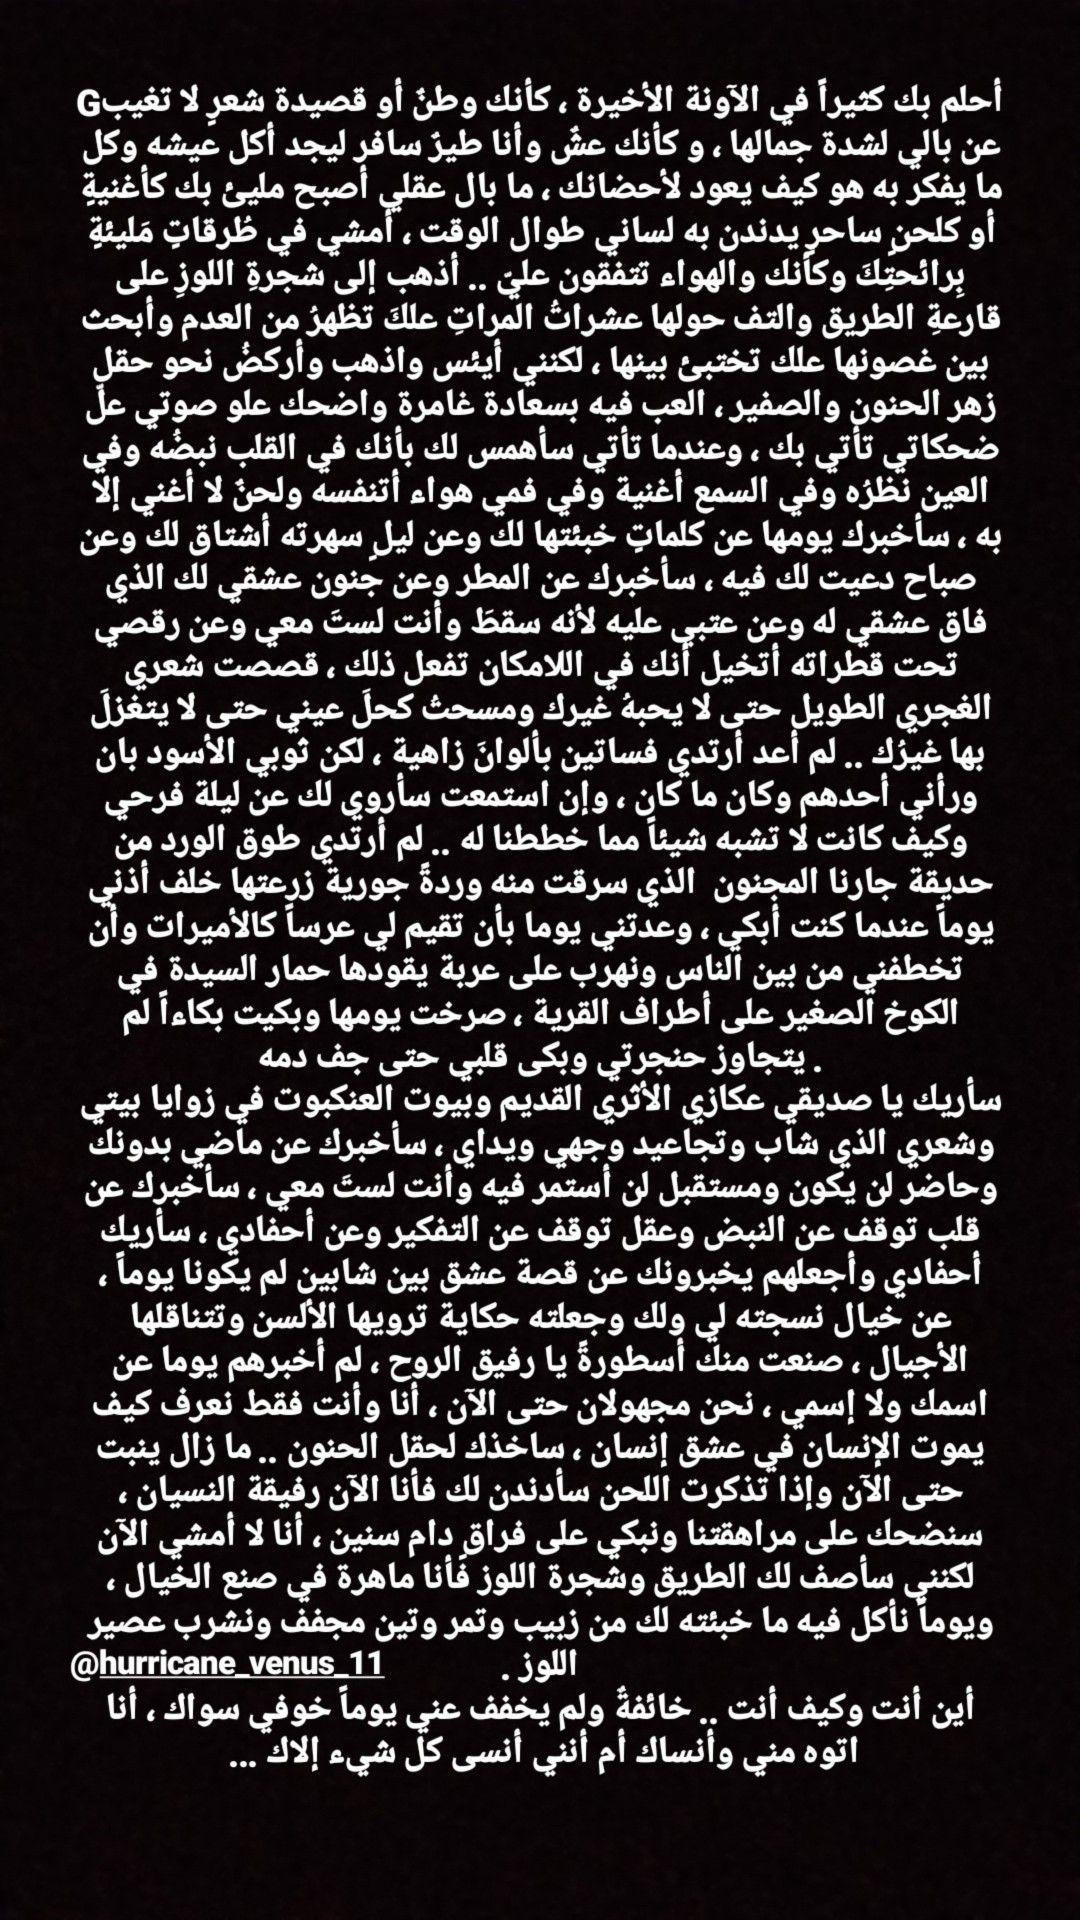 Pin by nuha alqadi on عبارات | Quotes, Arabic quotes, Funny